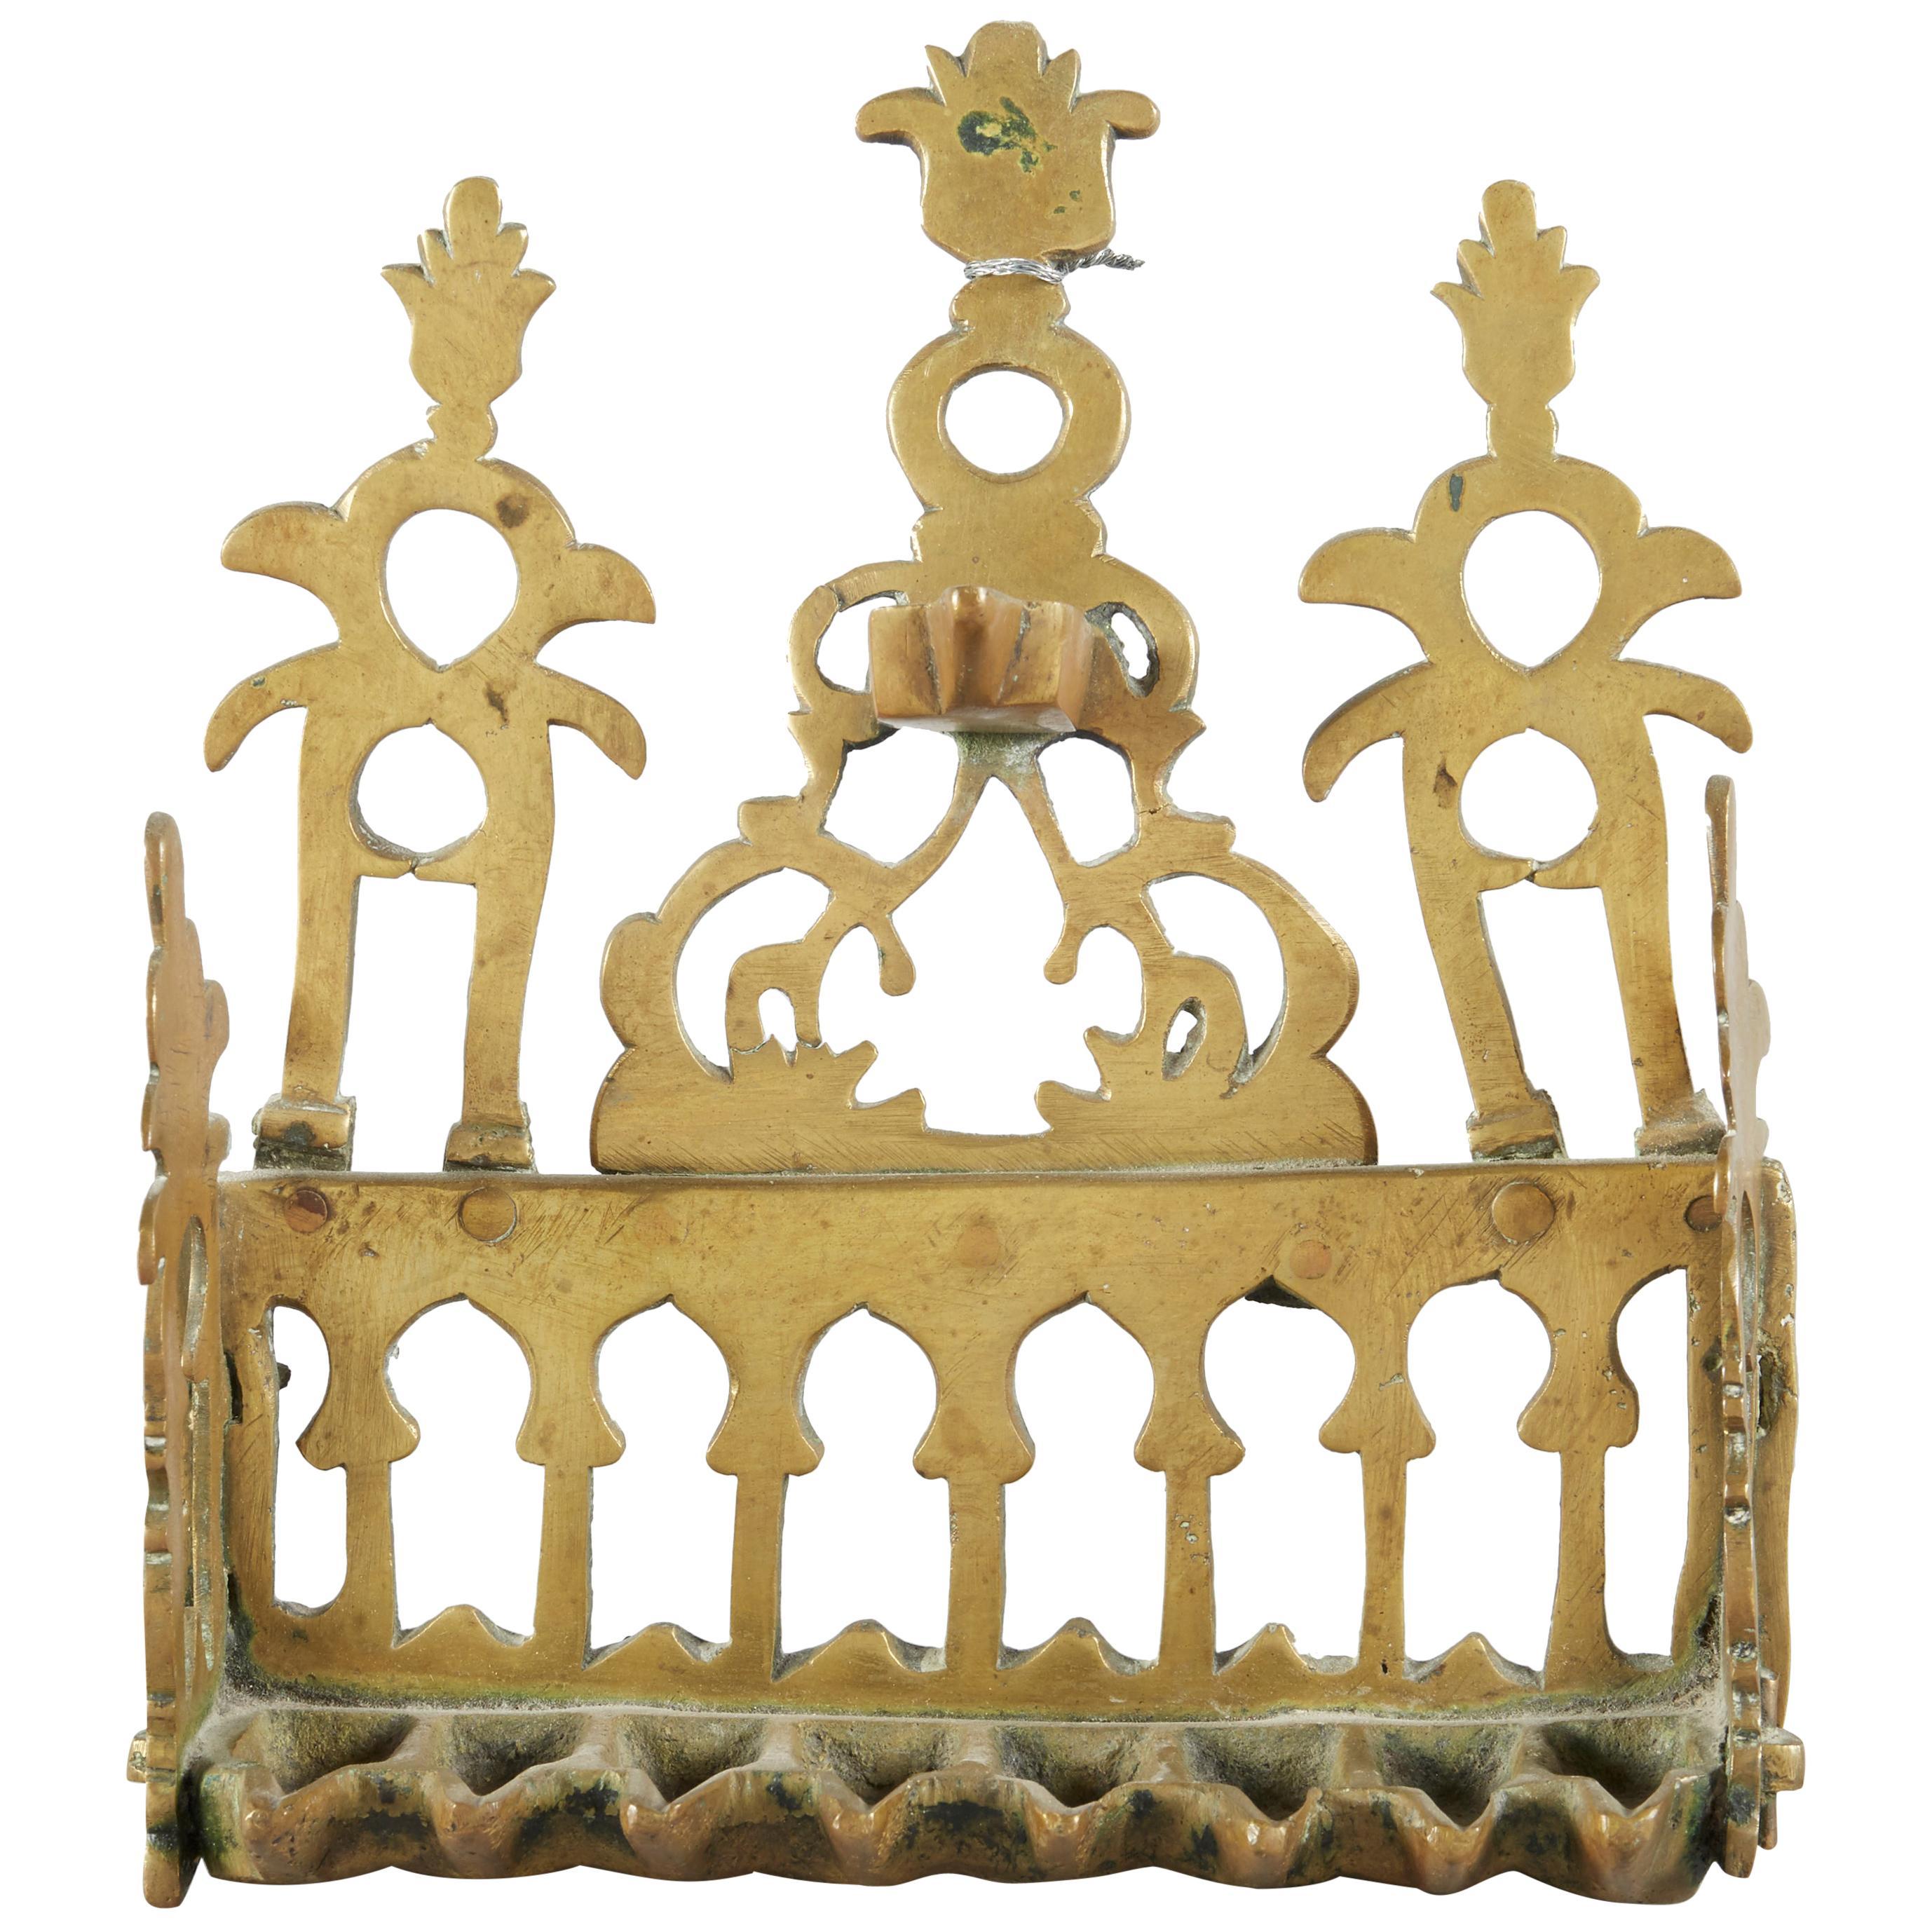 Early 20th Century North African Brass Hanukkah Lamp Menorah